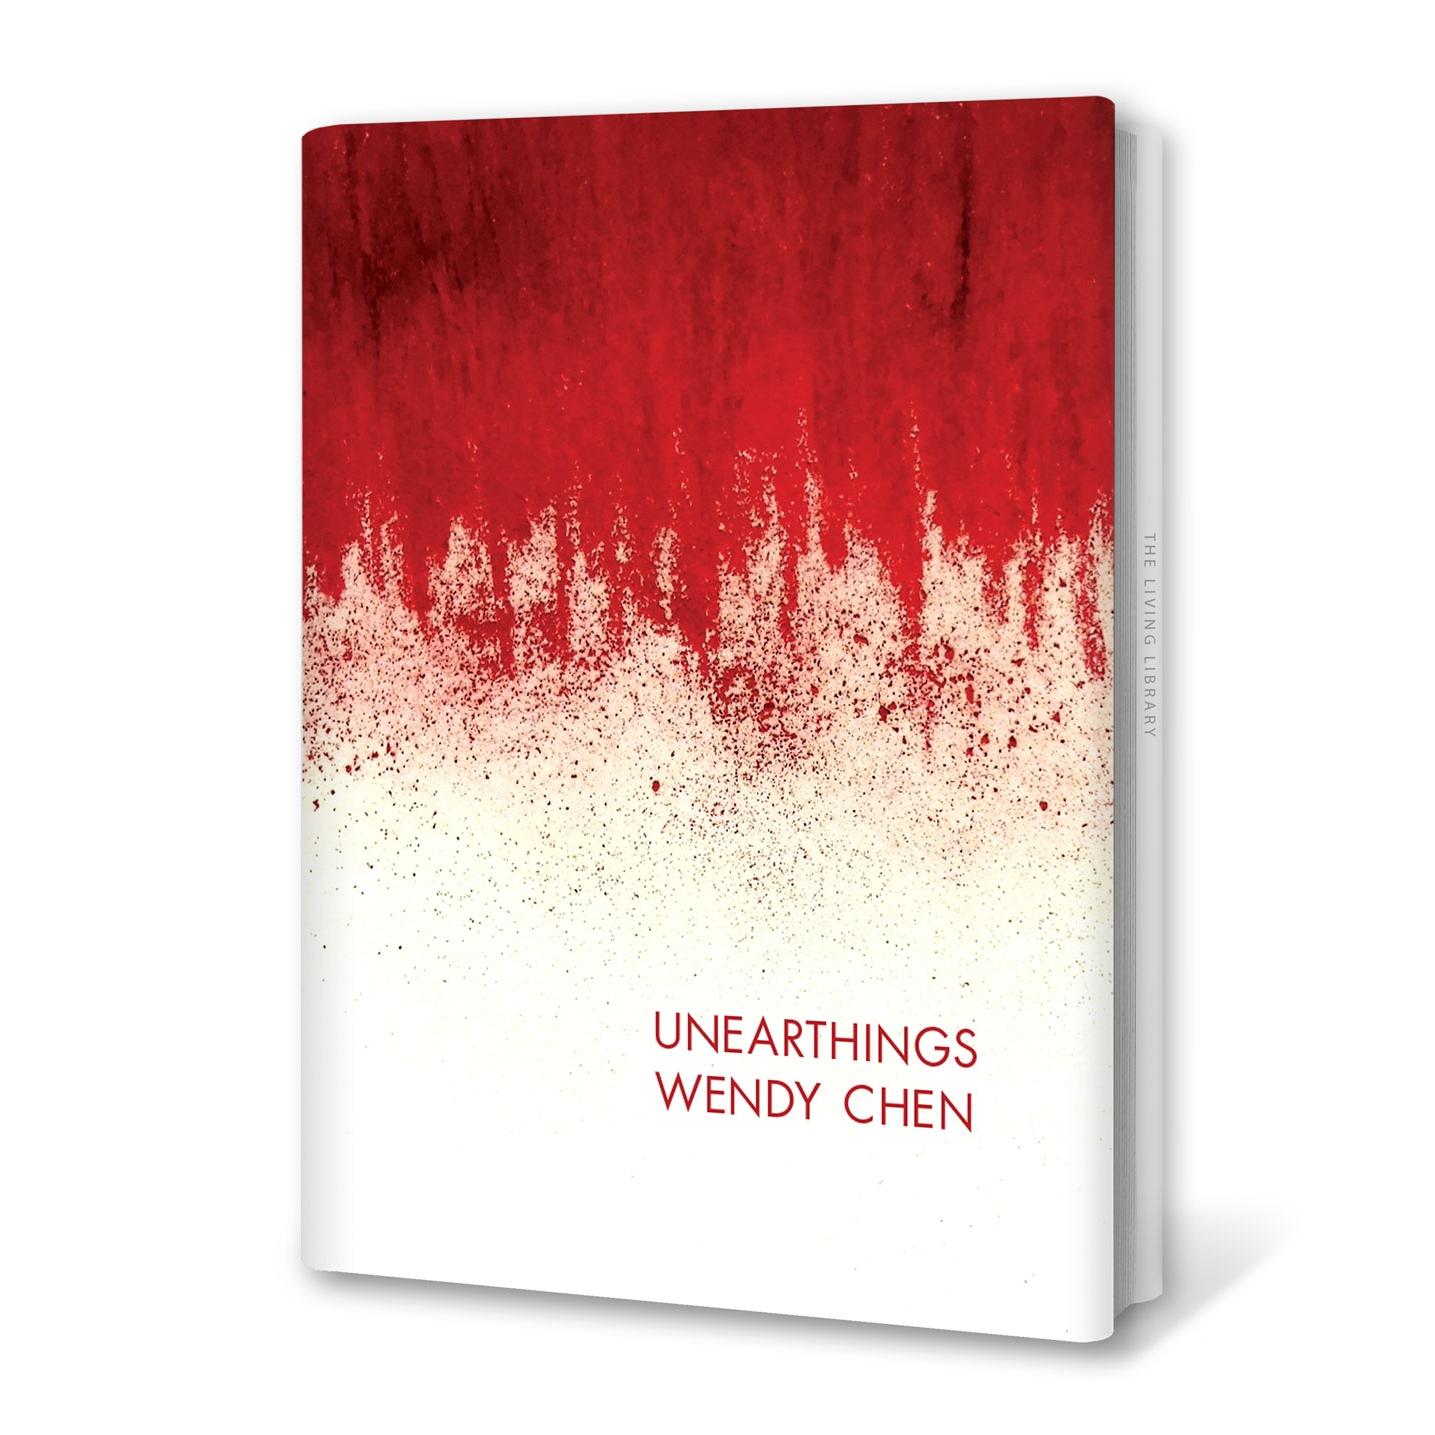 tavern-chen-unearthings-1500x1500.jpg